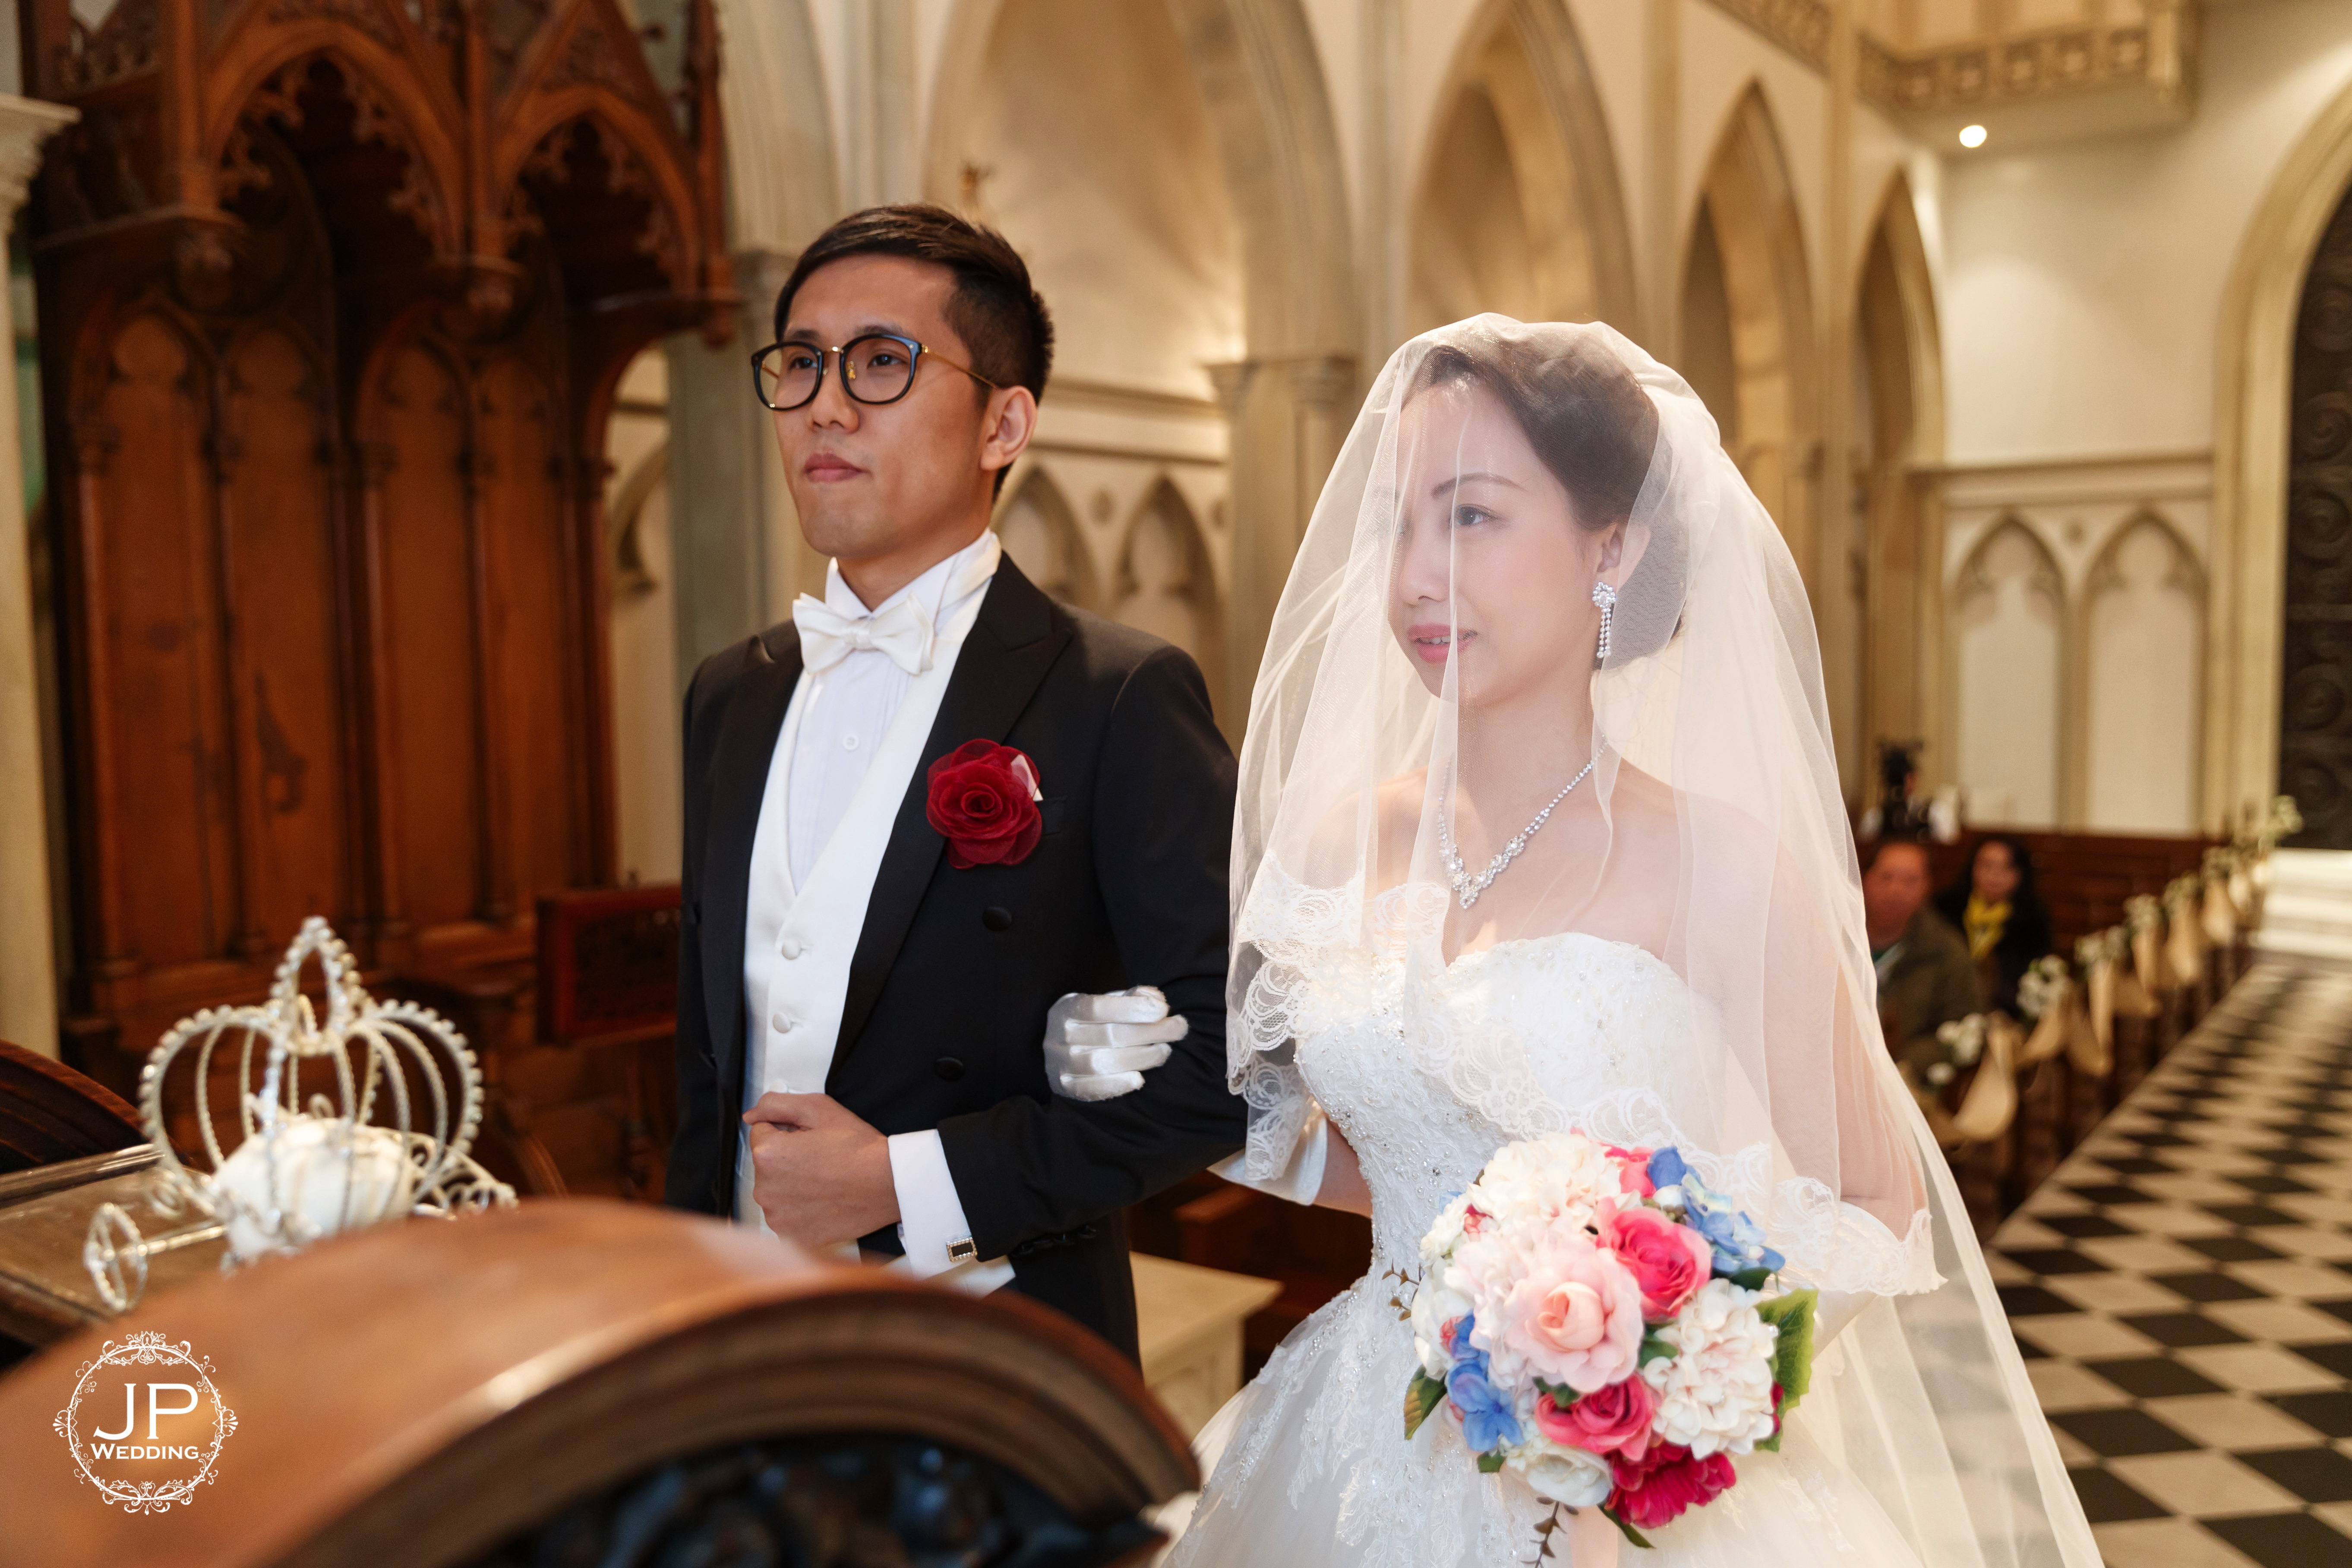 JP Wedding HK, Nagoya Glastonia 2018-11